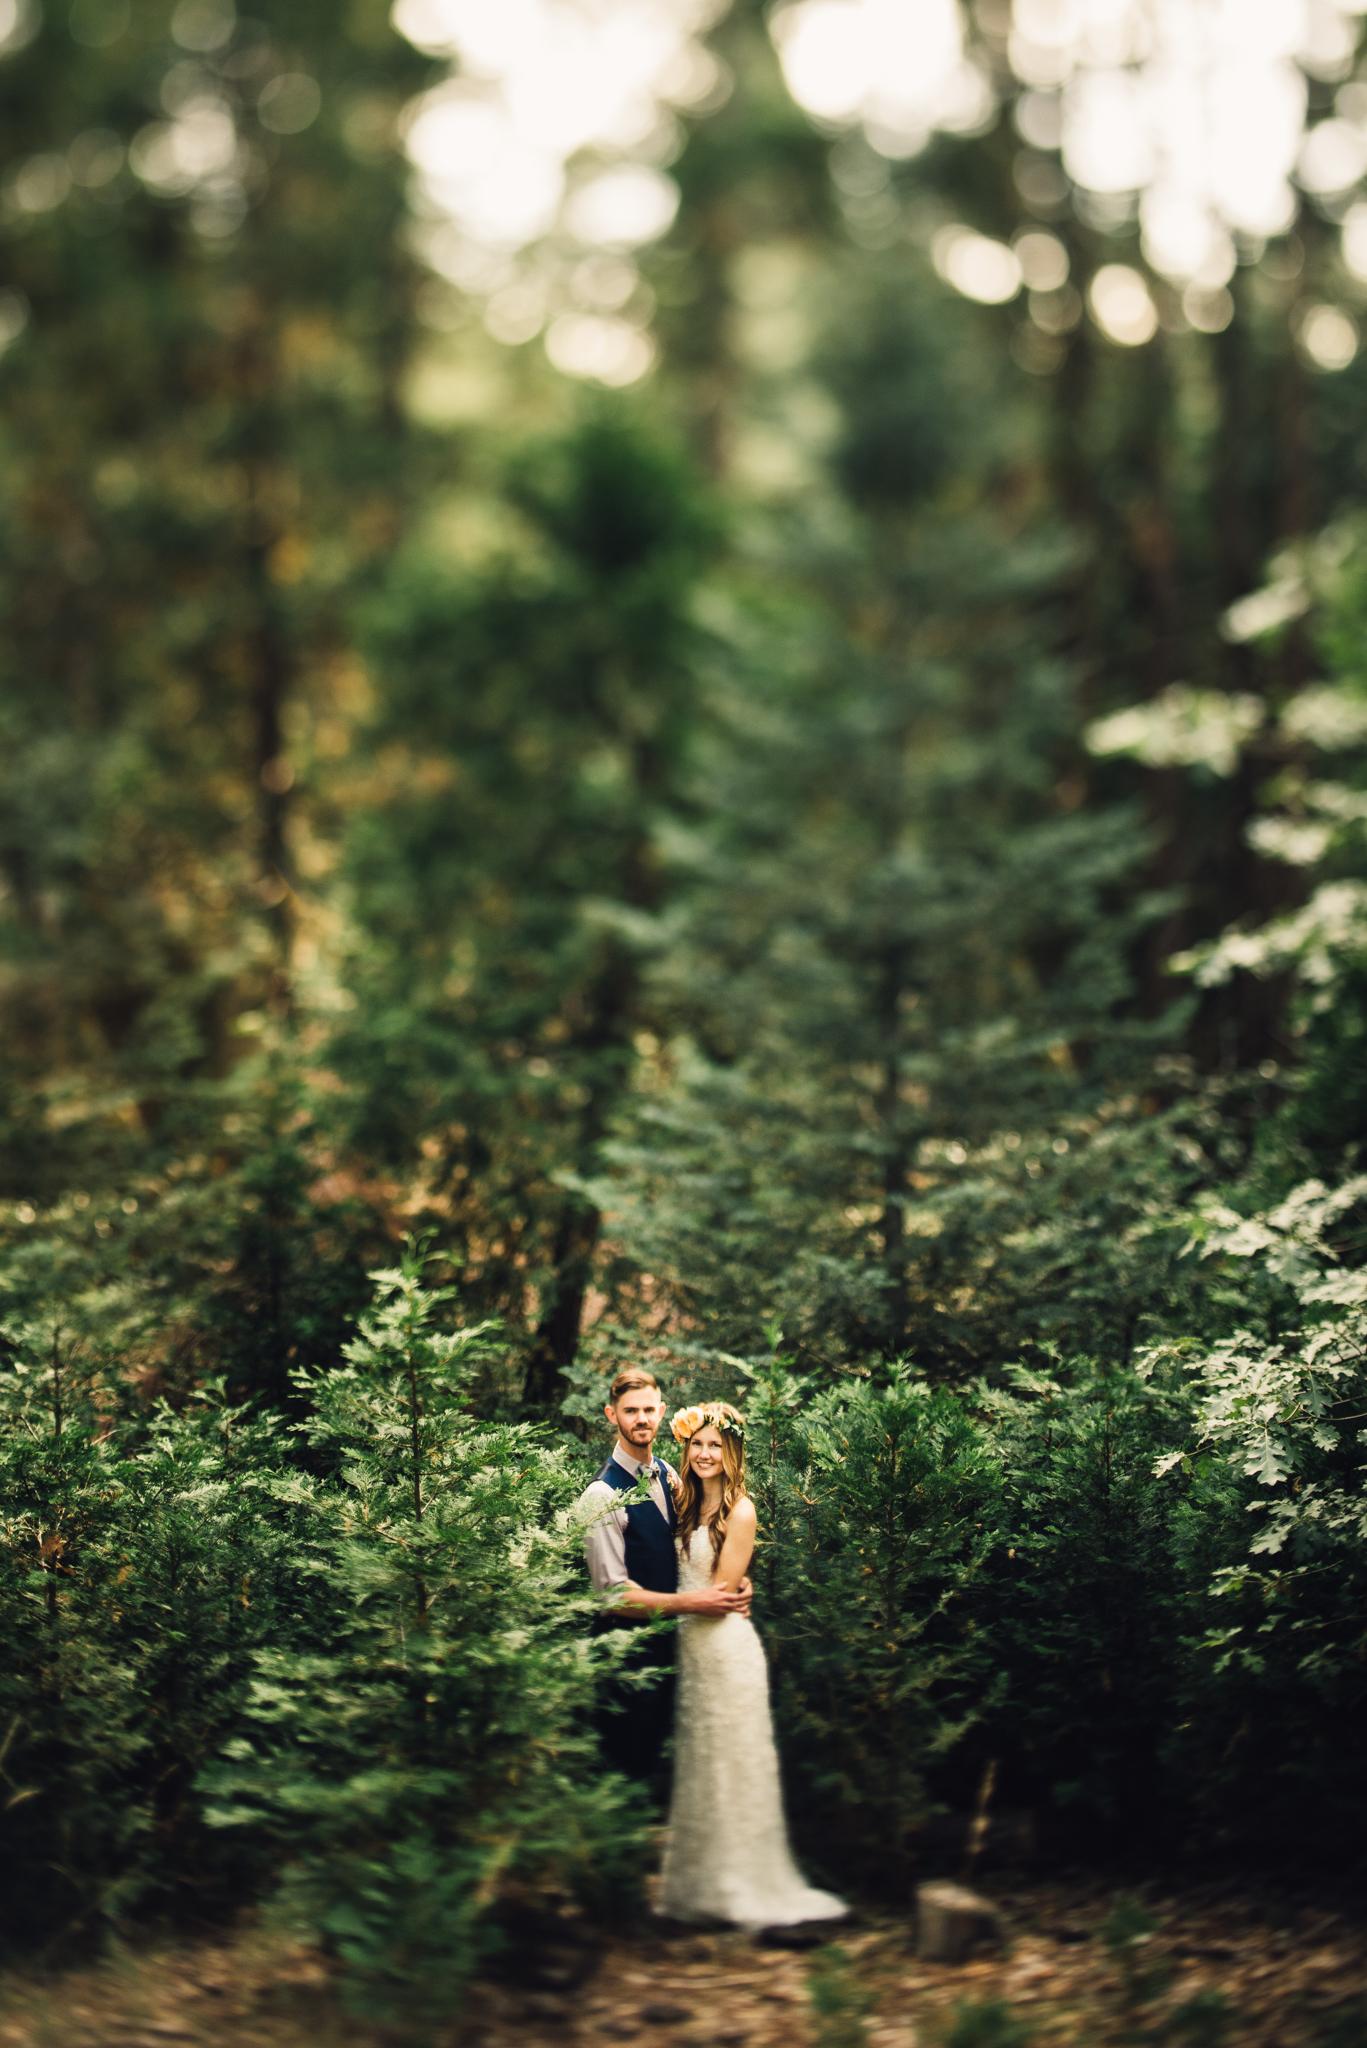 ©Isaiah & Taylor Photography - Pine Rose Cabin - Lake Arrowhead - Los Angeles Wedding Photographer-072.jpg